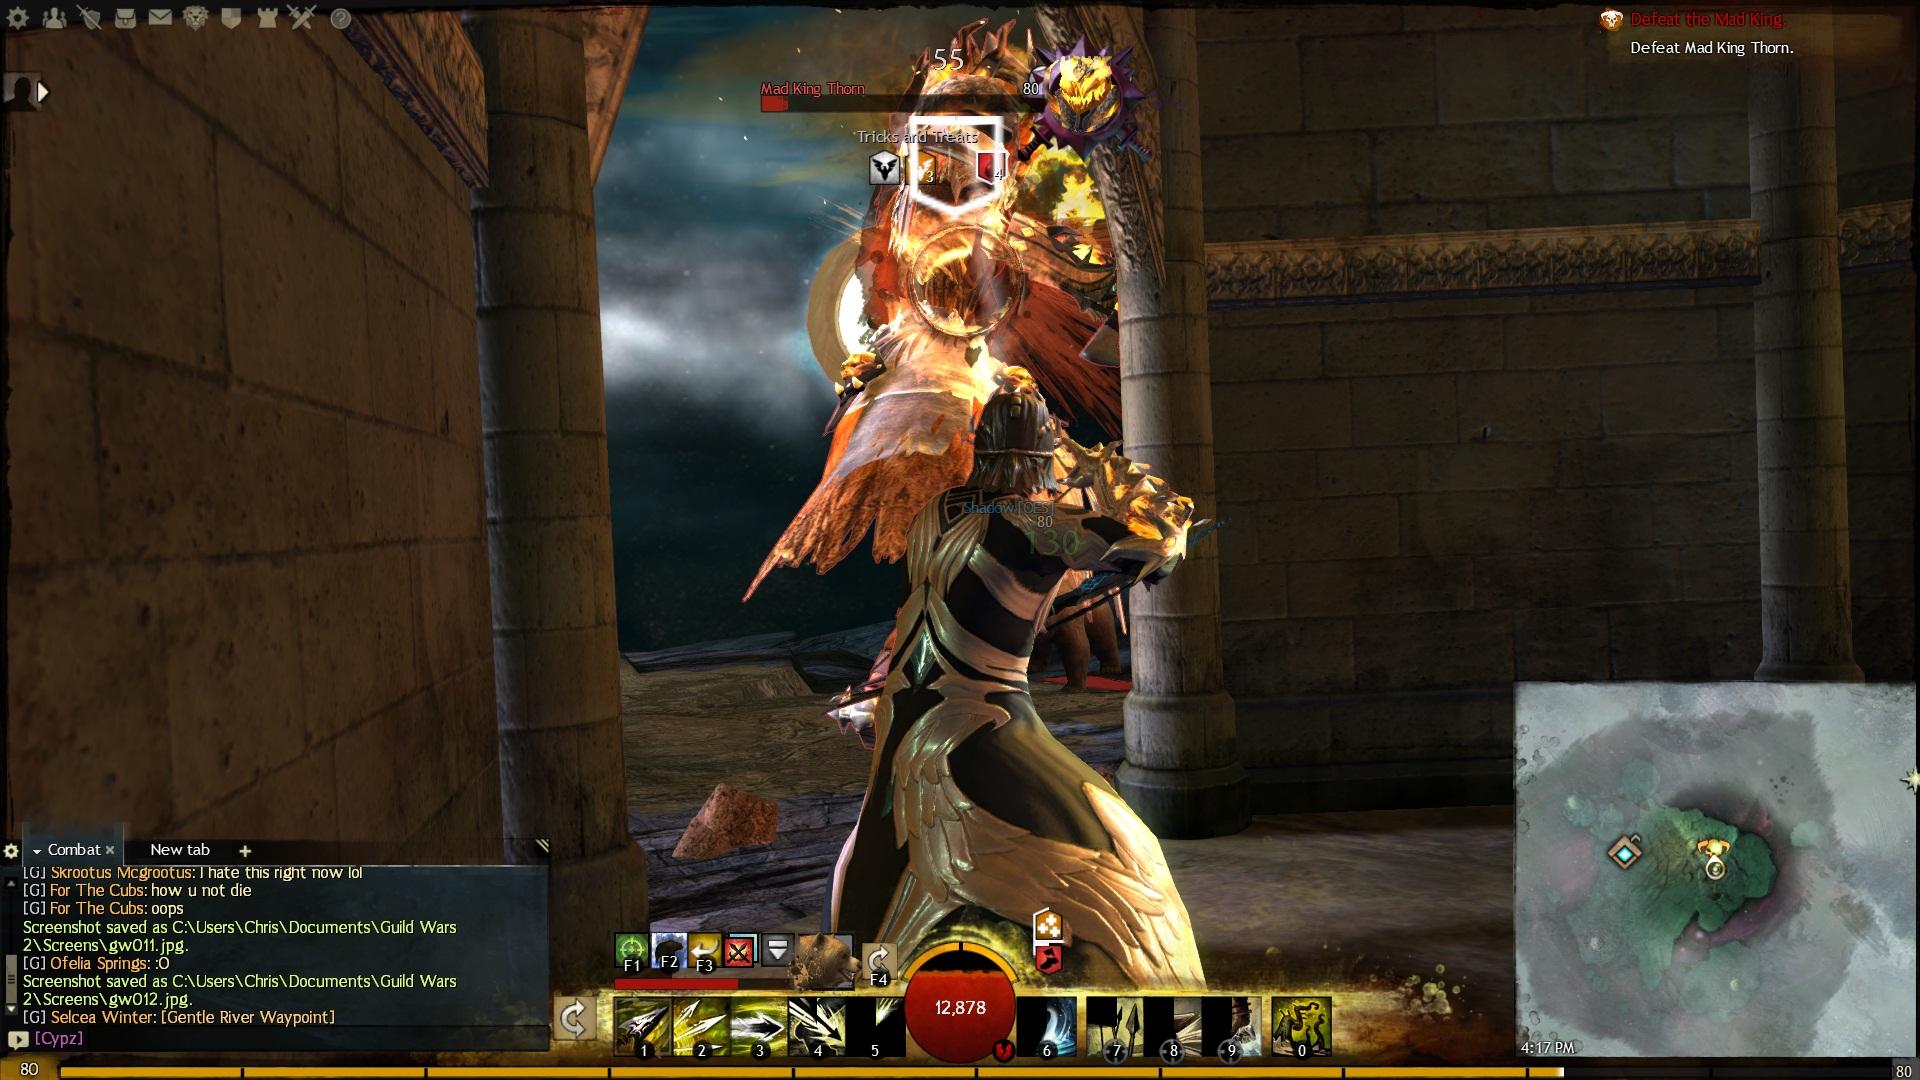 asilius games link deleted videomedia wars guild